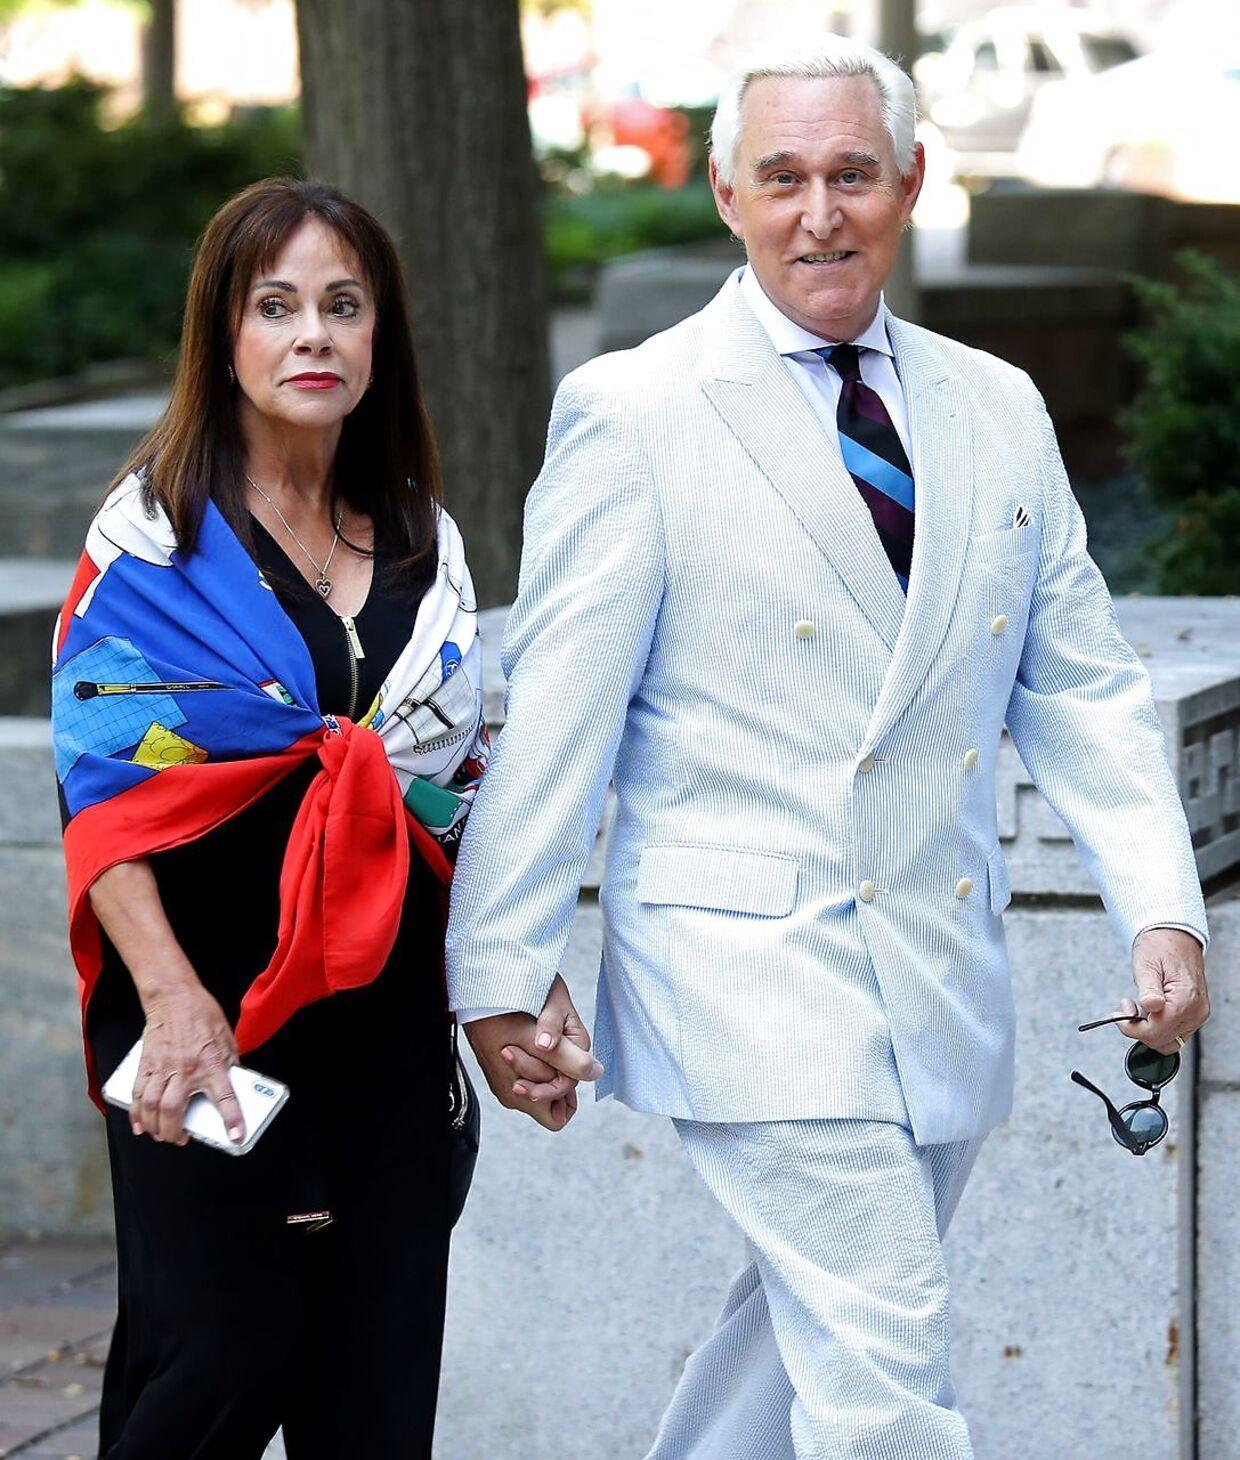 Roger Stone sammen med sin kone, Nydia Stone.